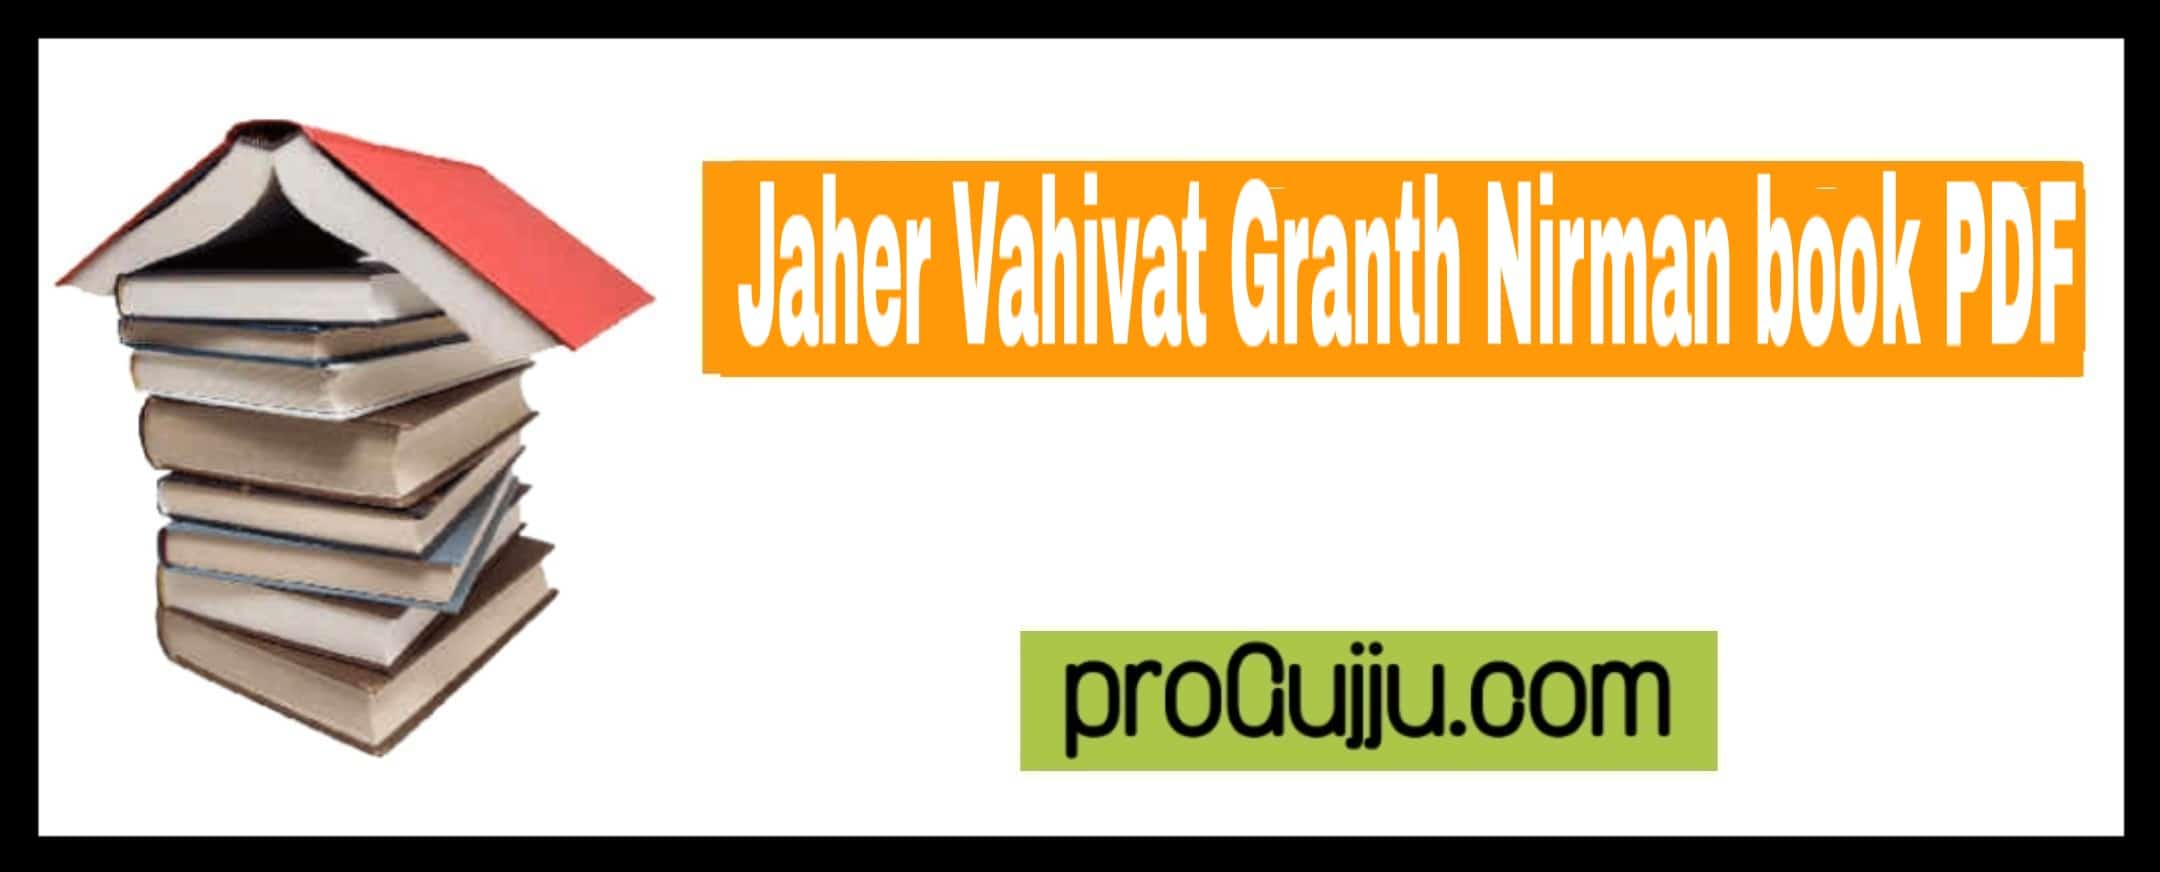 Jaher Vahivat Granth Nirman book PDF